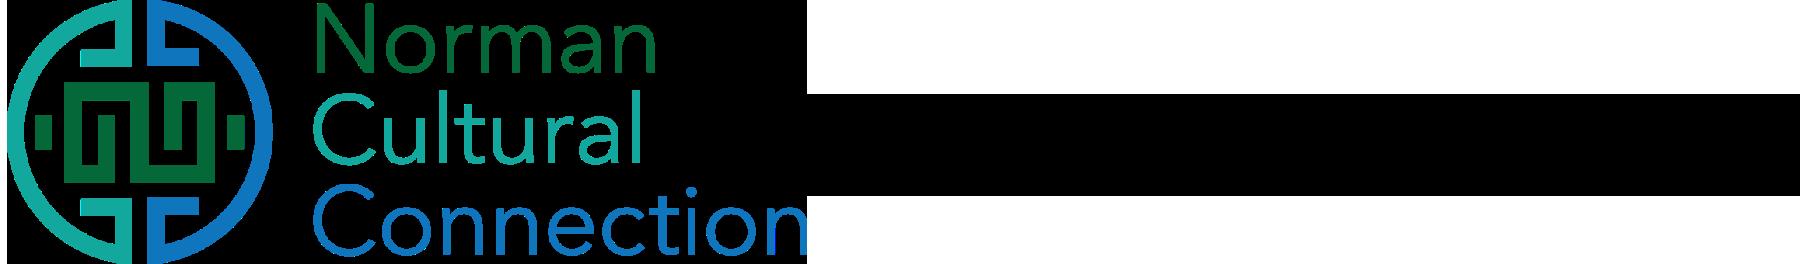 Norman Cultural Connection Logo